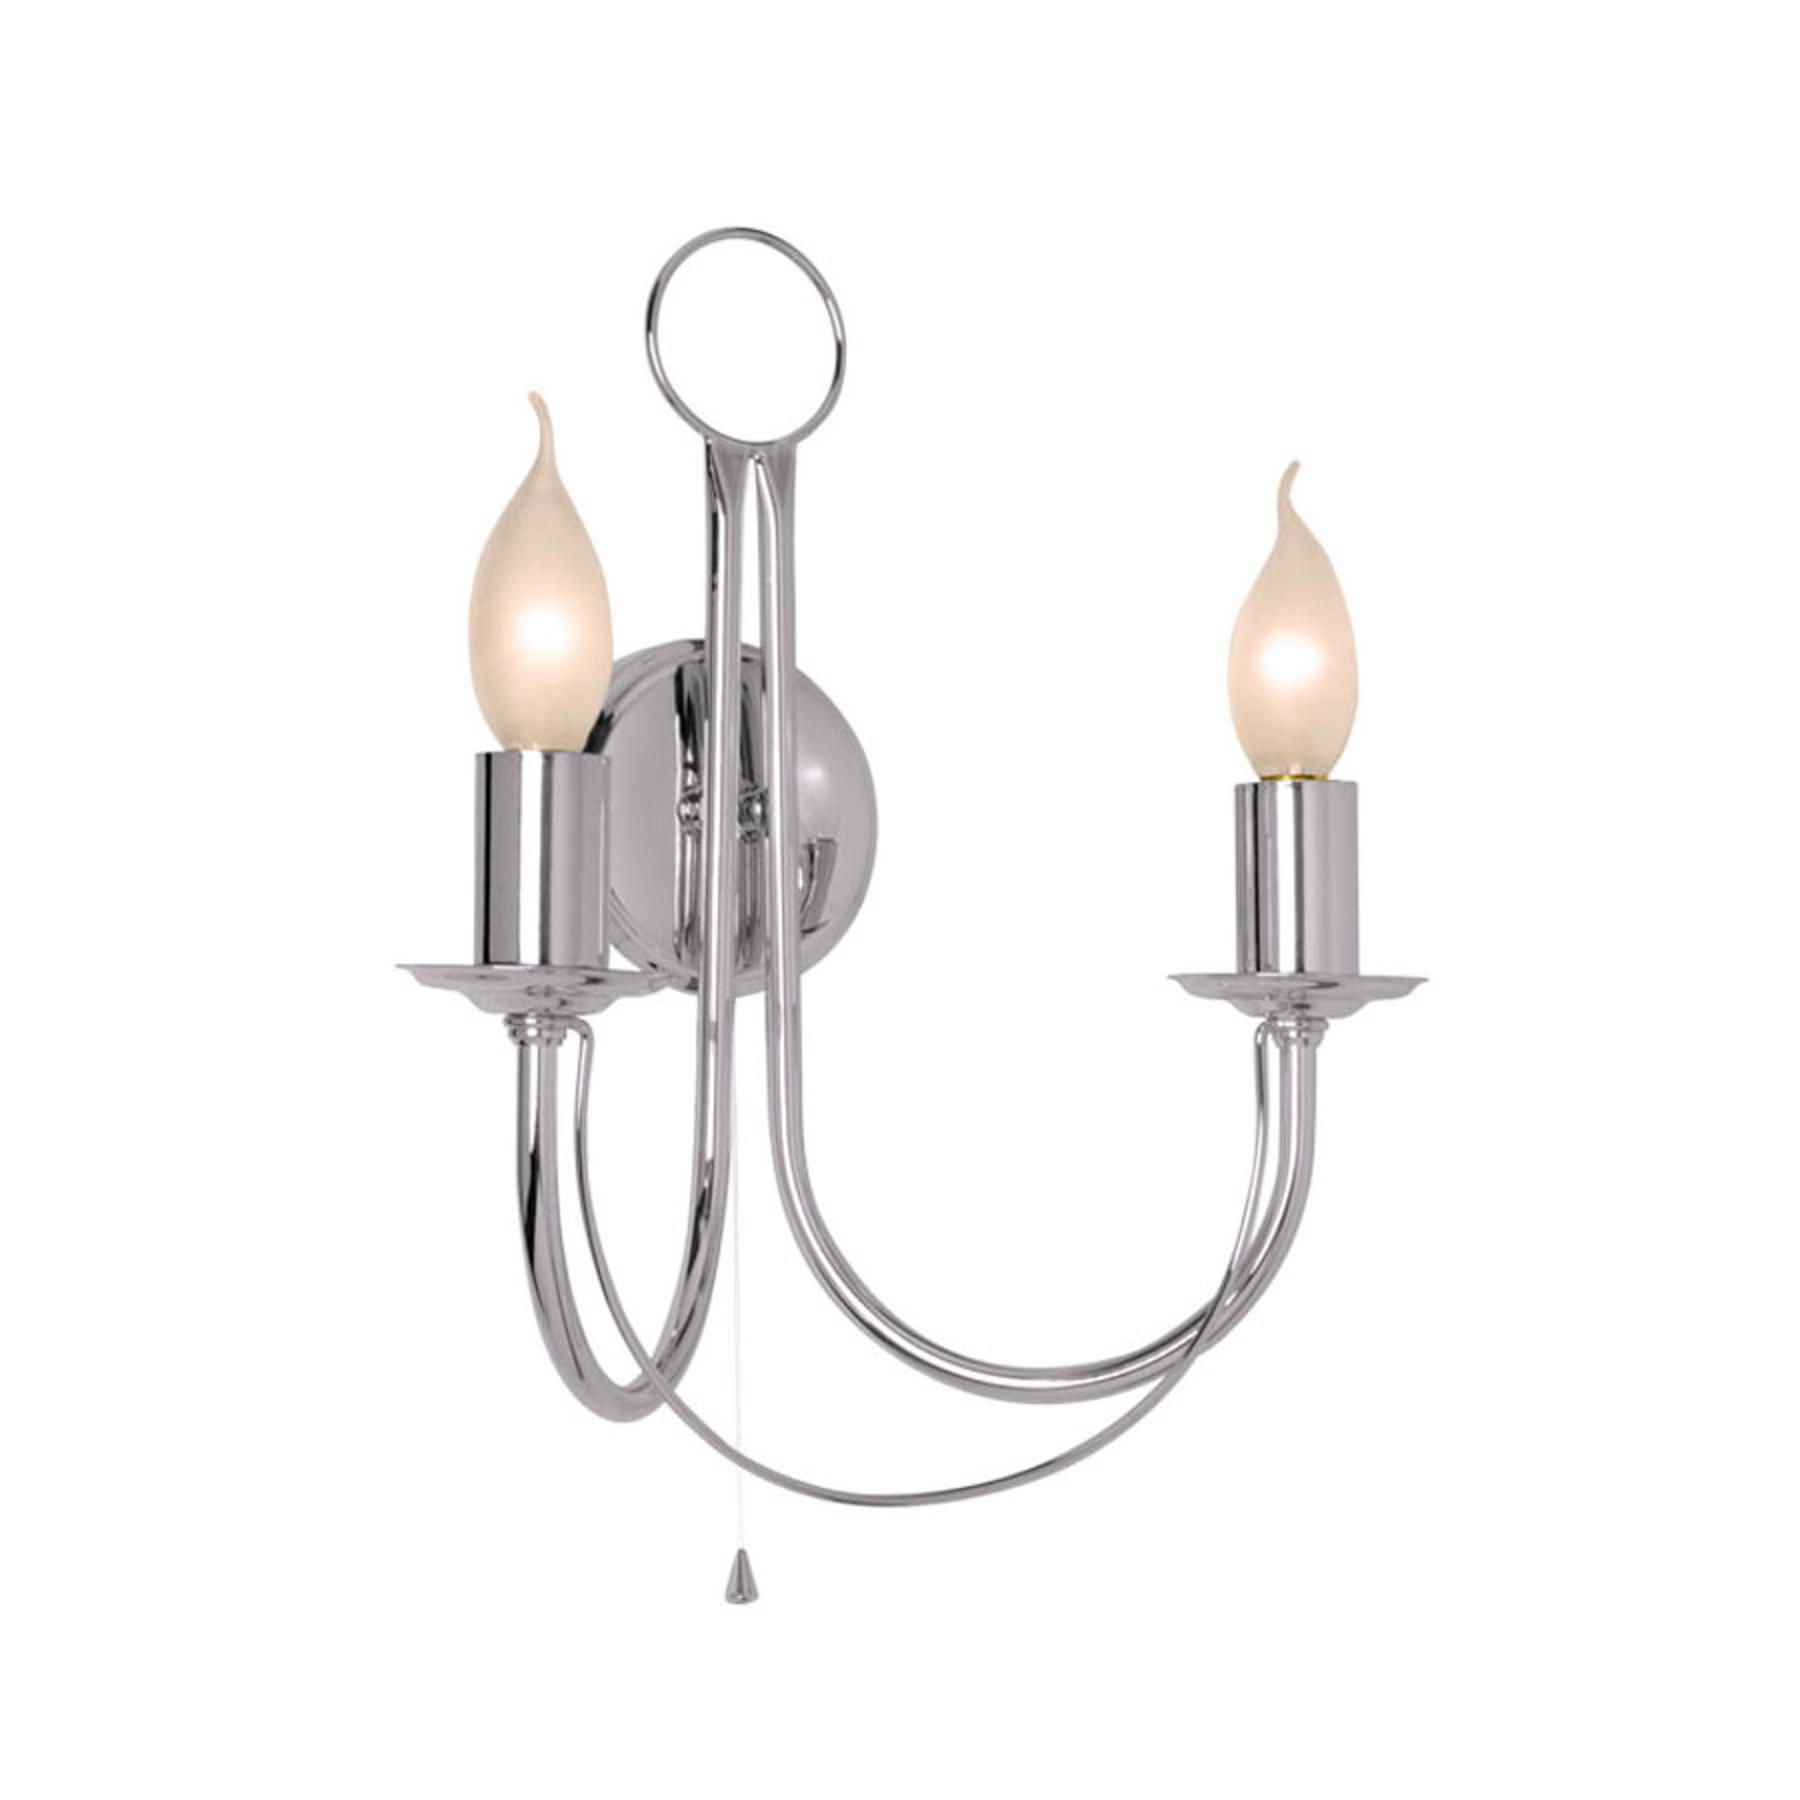 Wandlamp Retro, 2-lamps, chroom